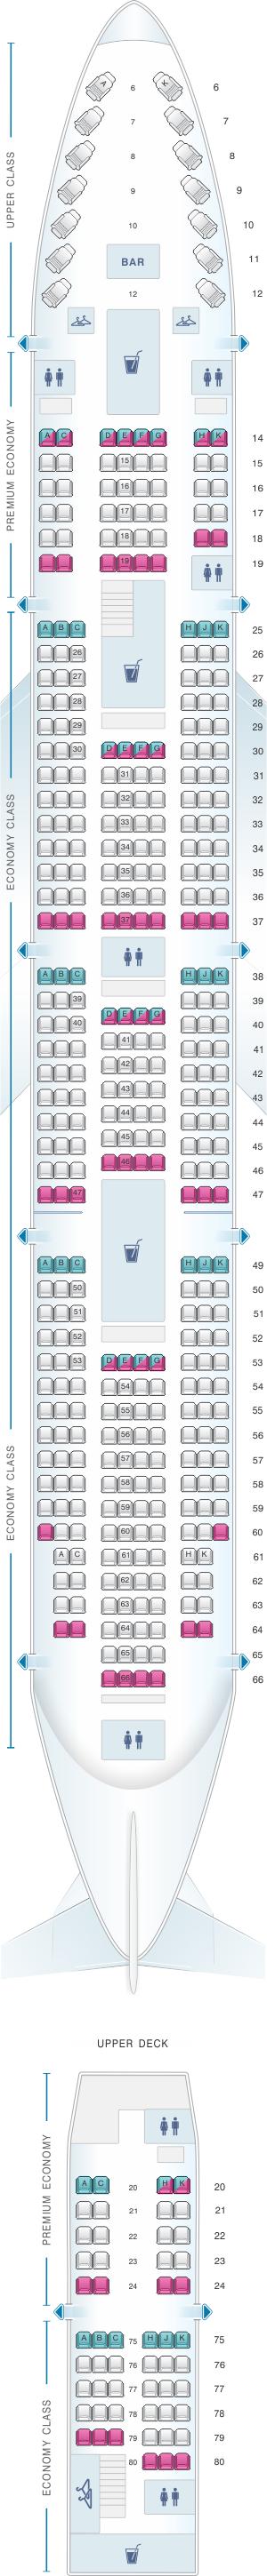 Seat map for Virgin Atlantic Boeing B747 400